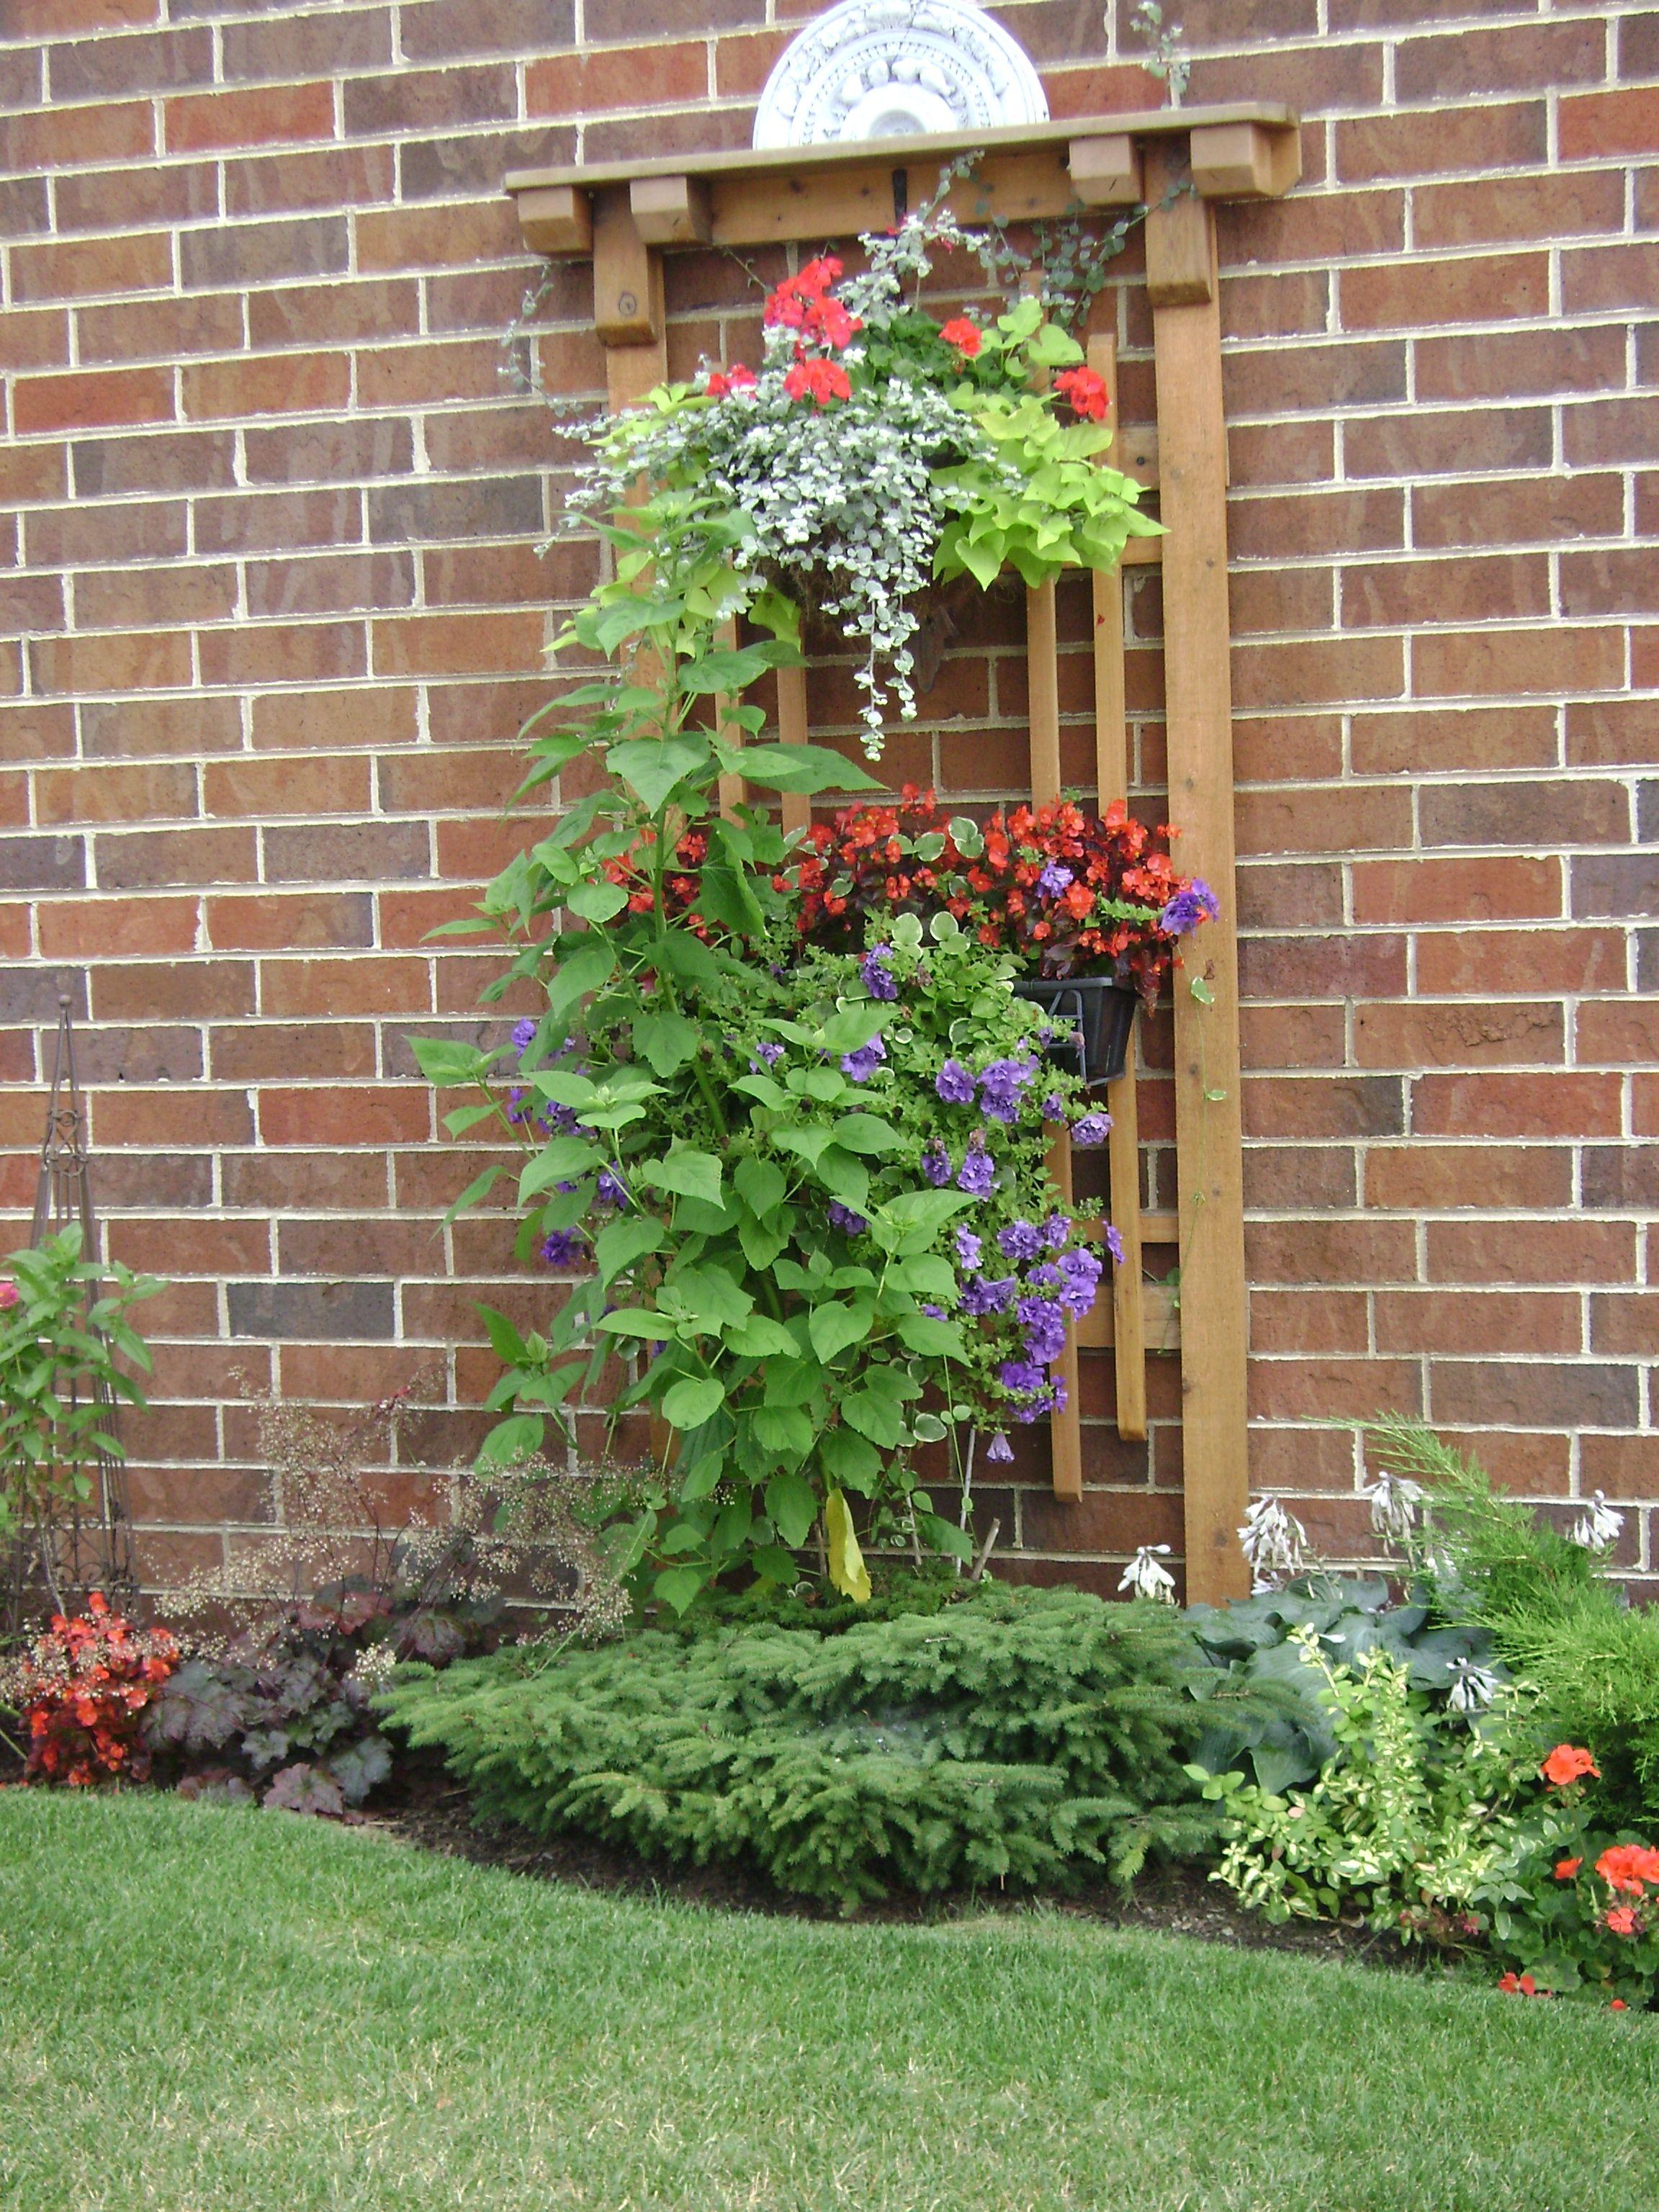 Outdoor wall decor | interior | Pinterest | Outdoor walls, Wall ...